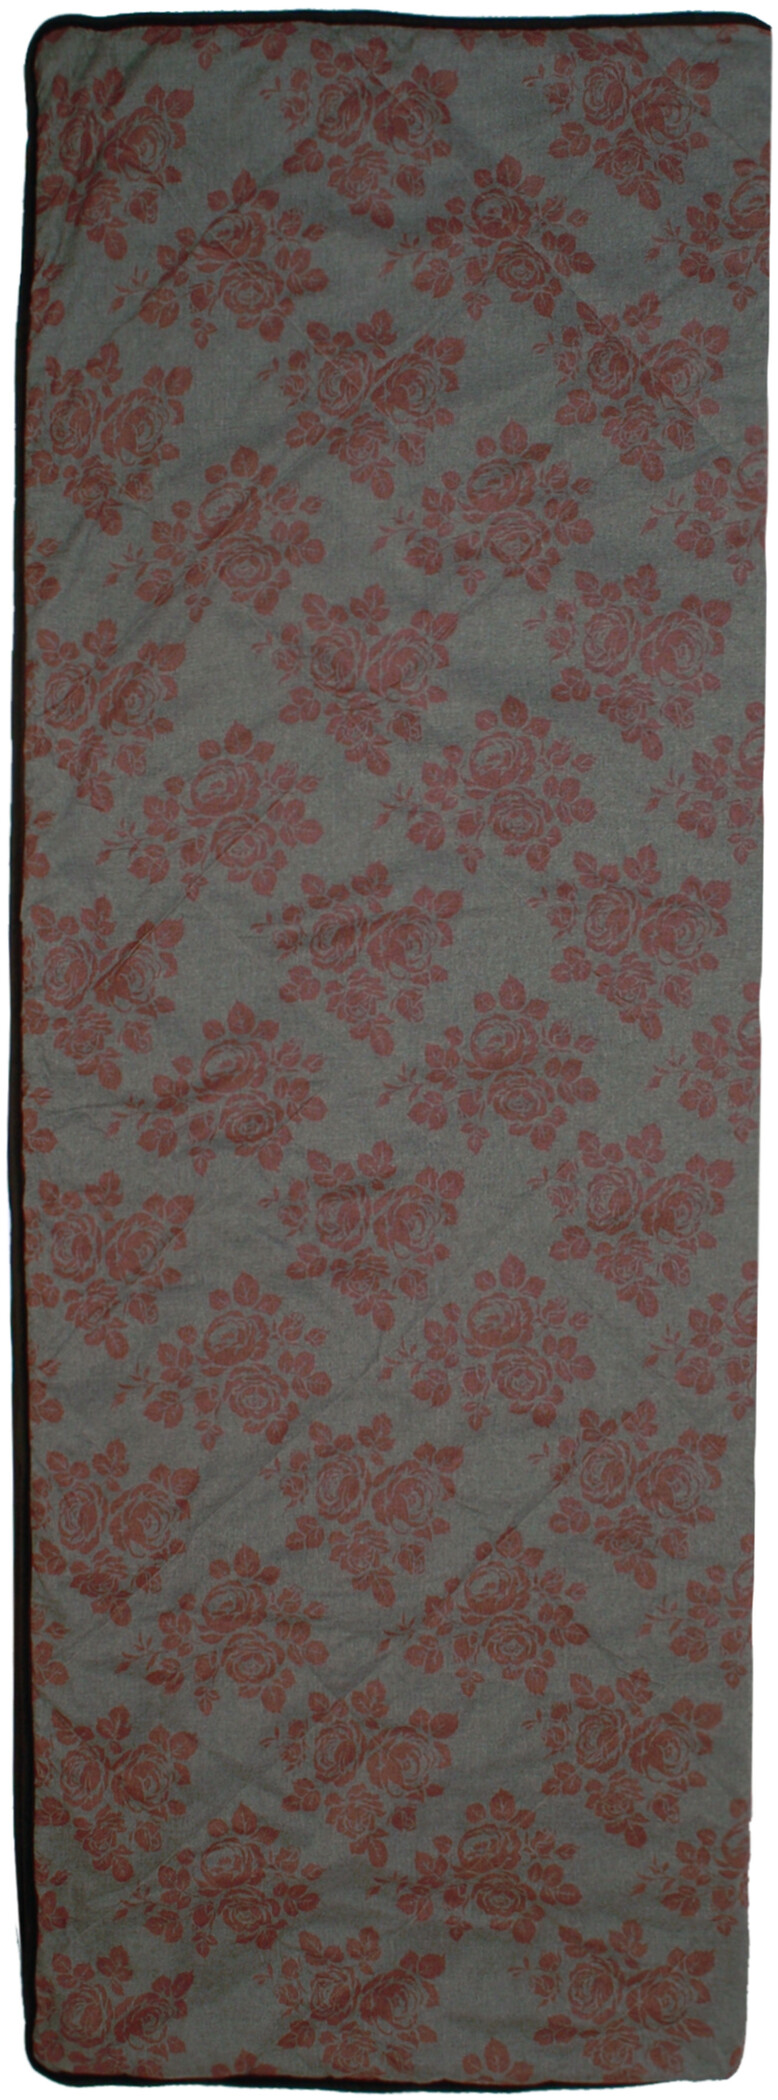 Grüezi-Bag WellhealthBlanket Wool Deluxe Sovepose, grey melange/berry | Transport og opbevaring > Tilbehør